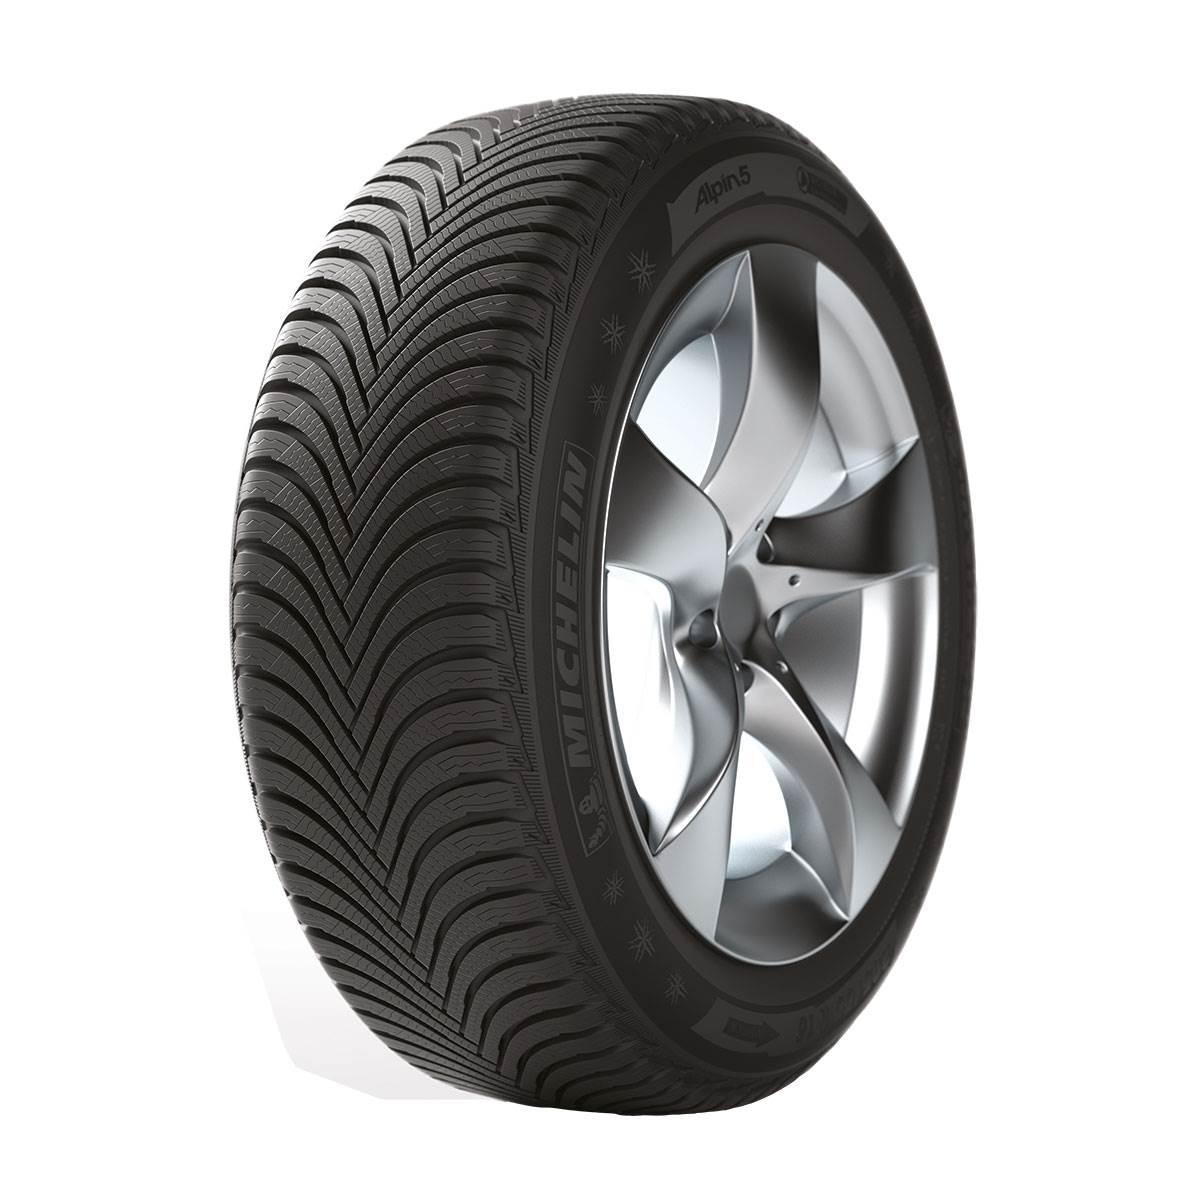 Pneu Hiver Michelin 225/50R17 98V Alpin A5 XL